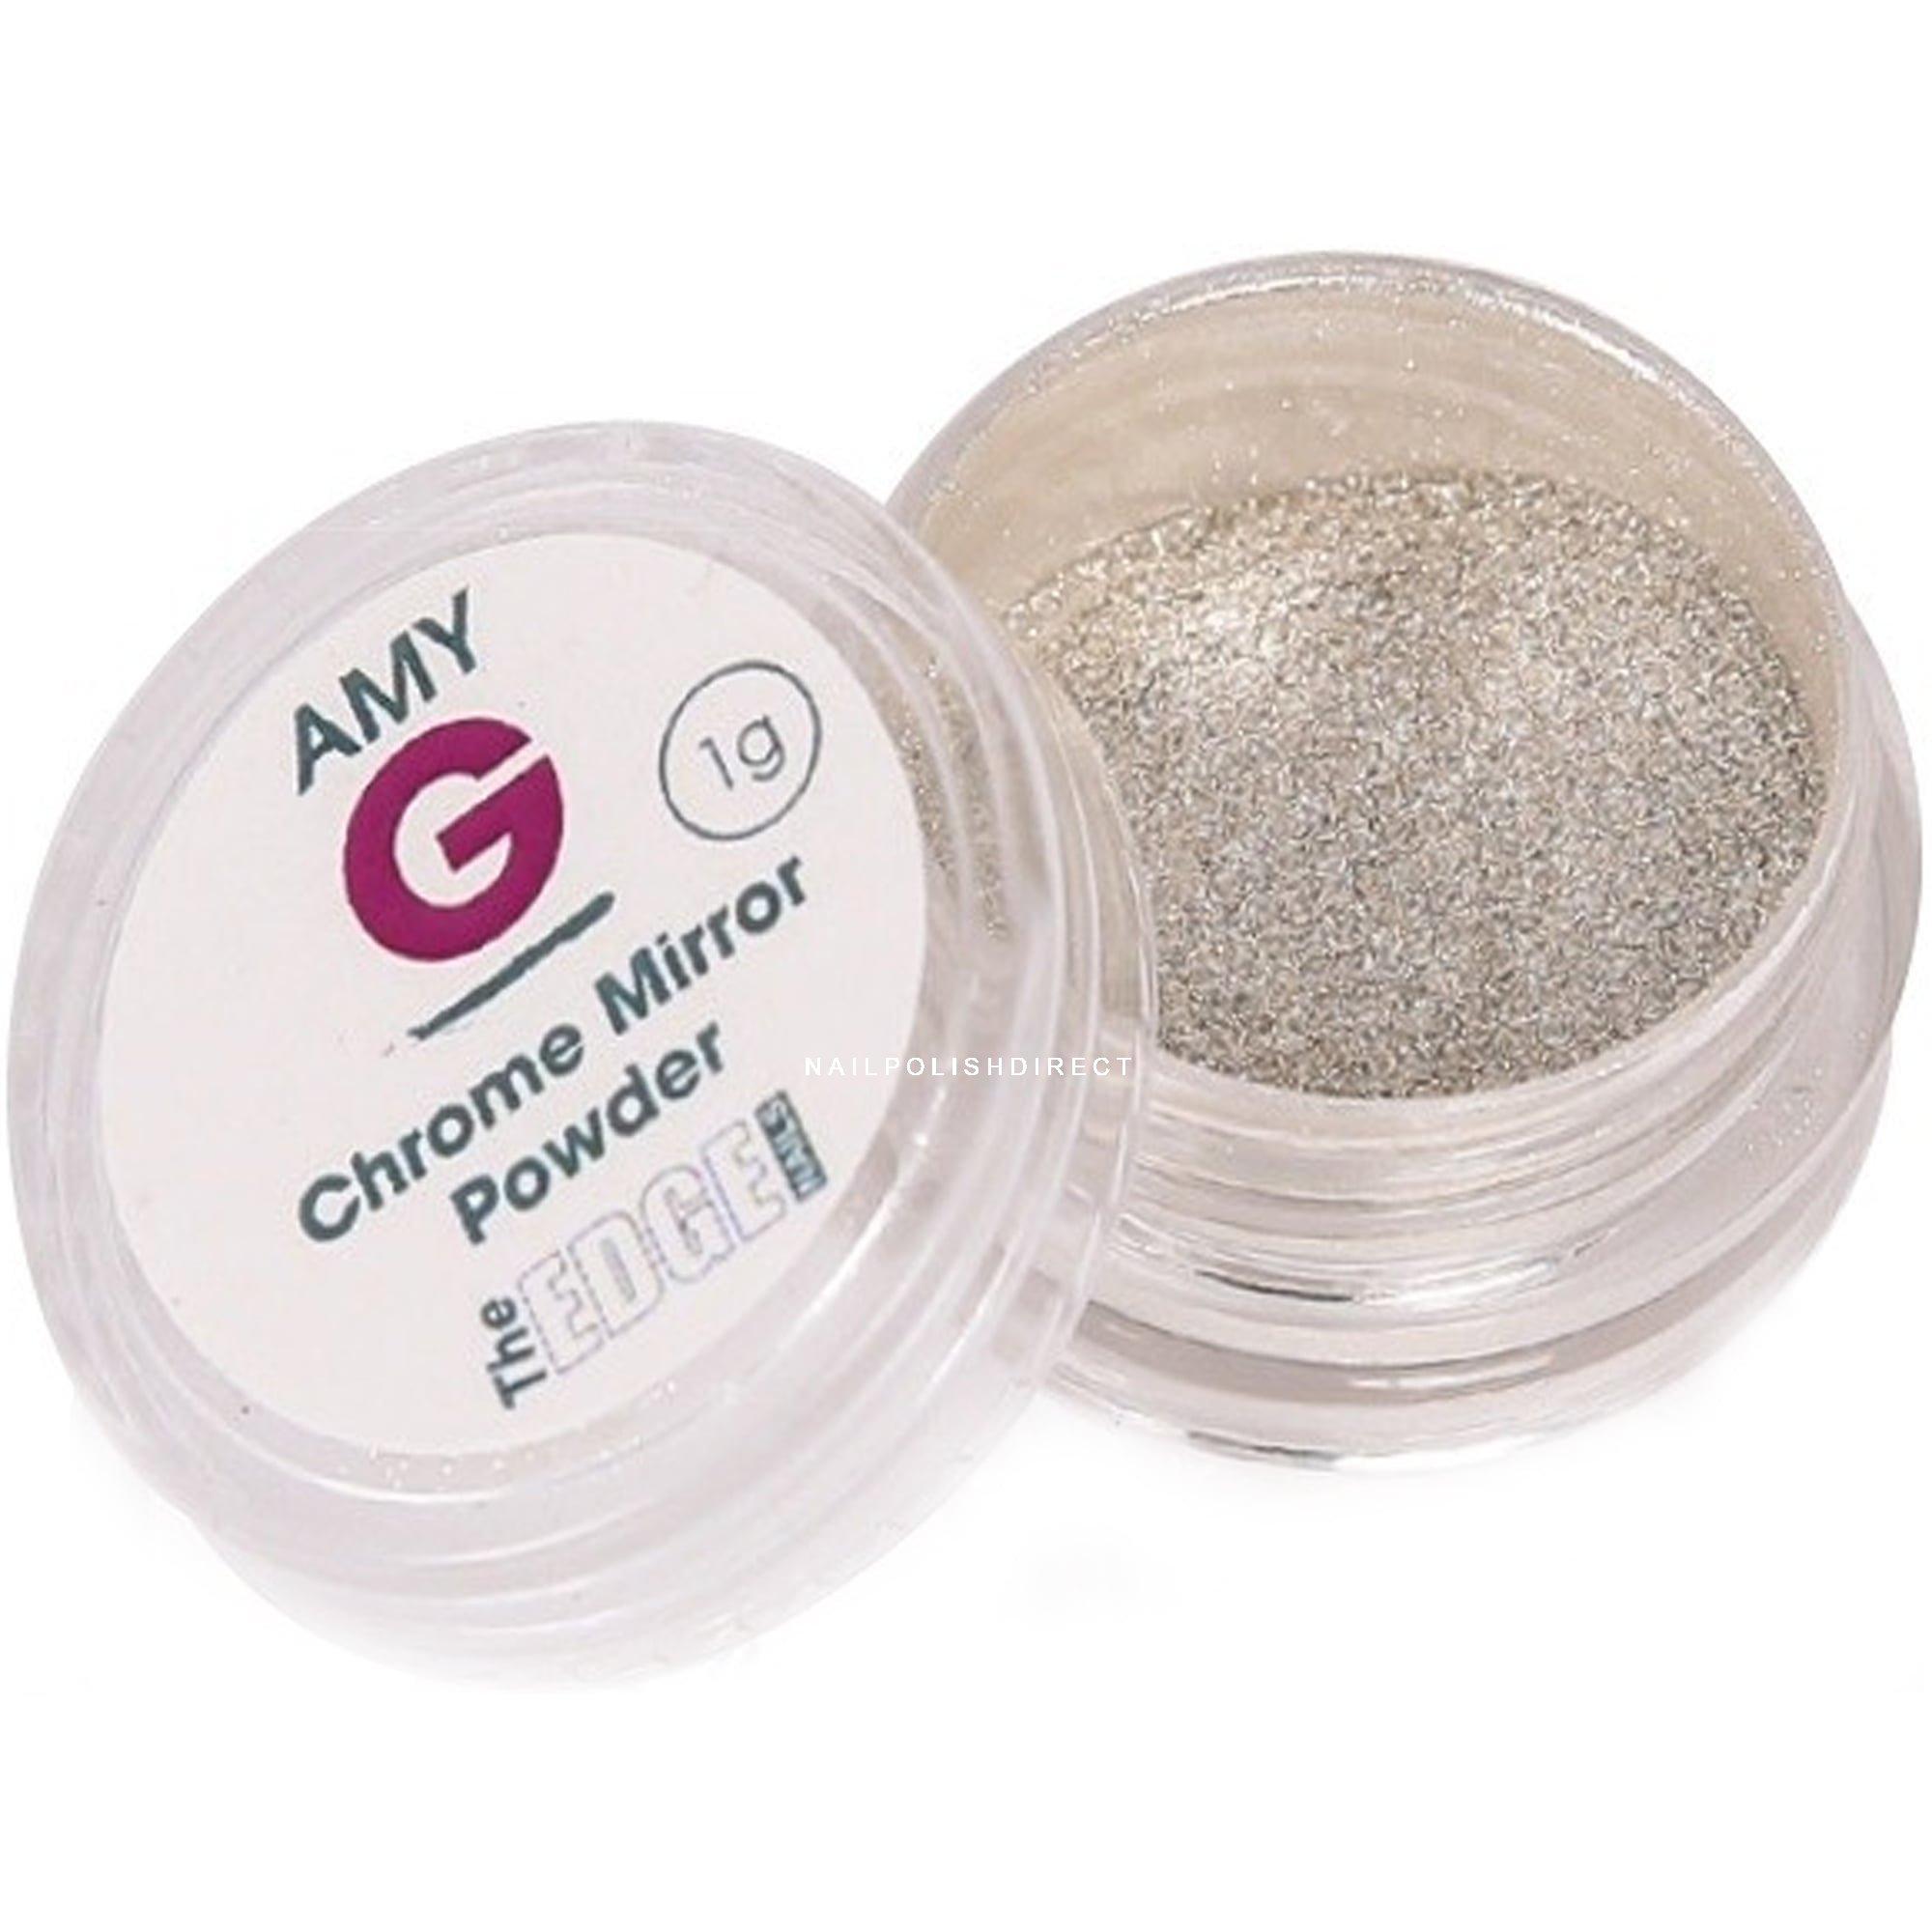 Amy G - Mirror Pigment Nail Art Powders - Chrome 1g (3003017)